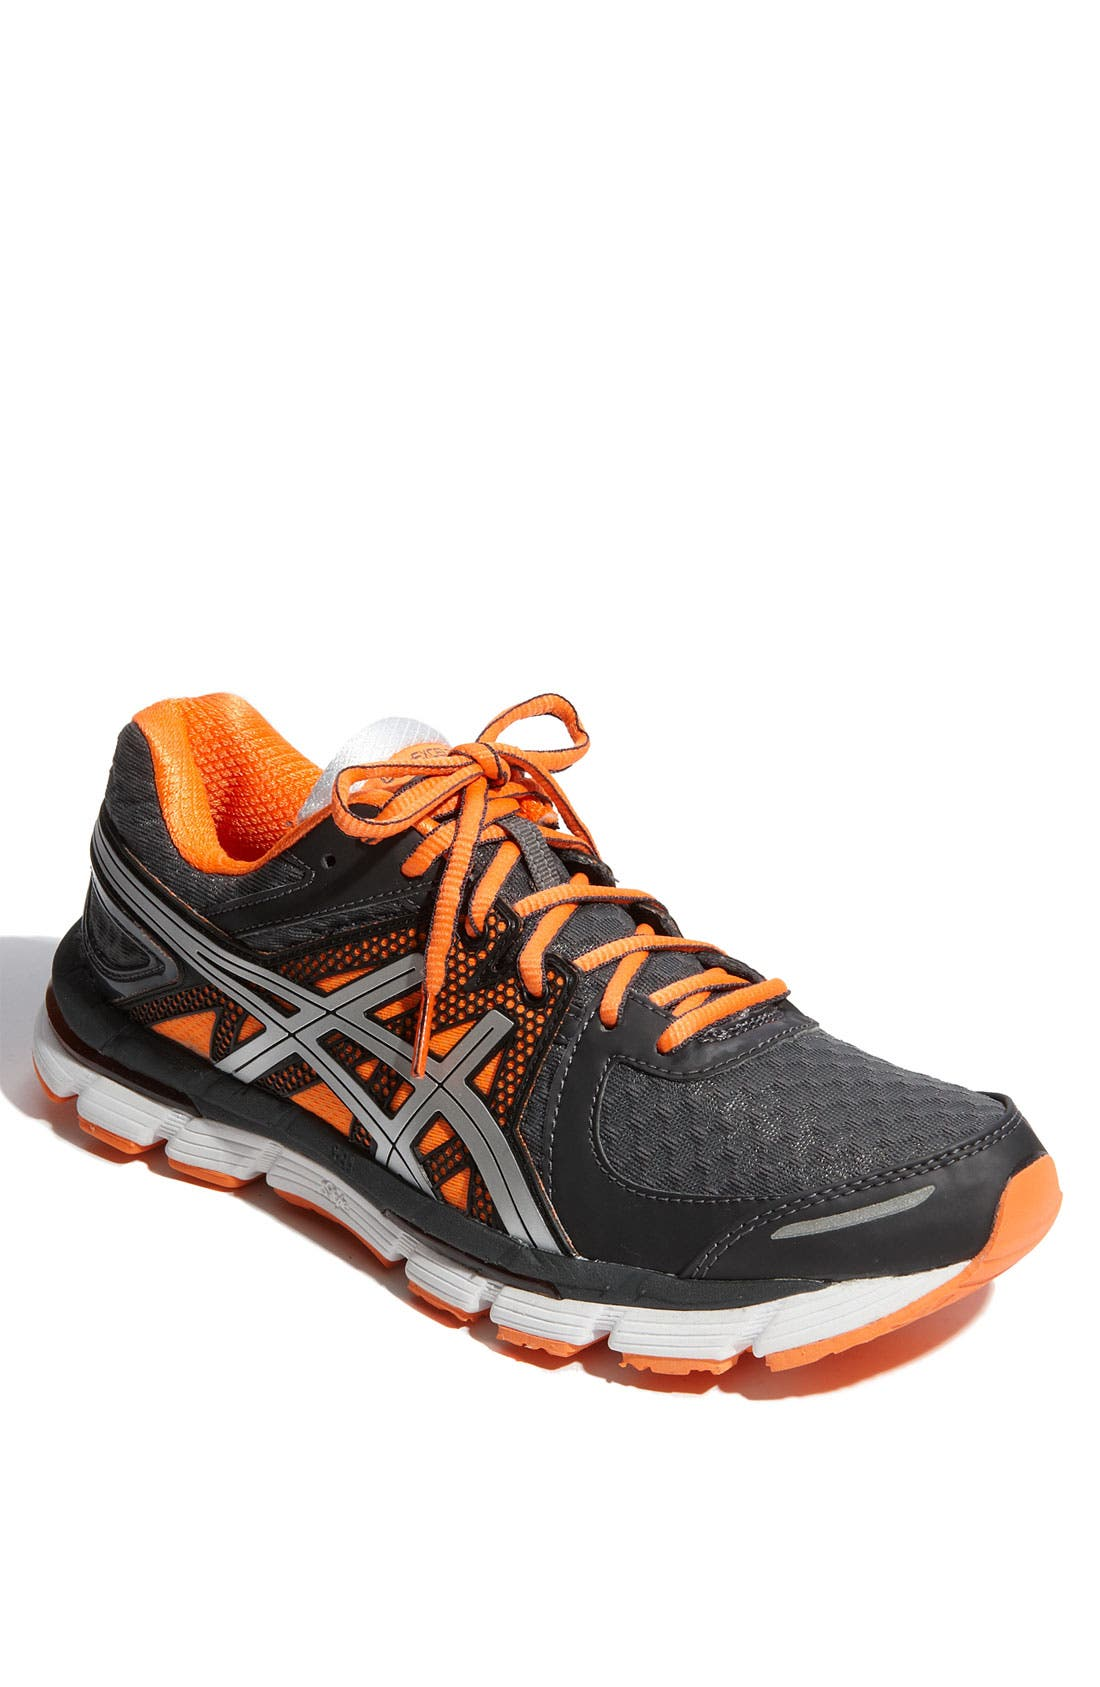 Alternate Image 1 Selected - ASICS® 'GEL-Excel 33' Running Shoe (Men)